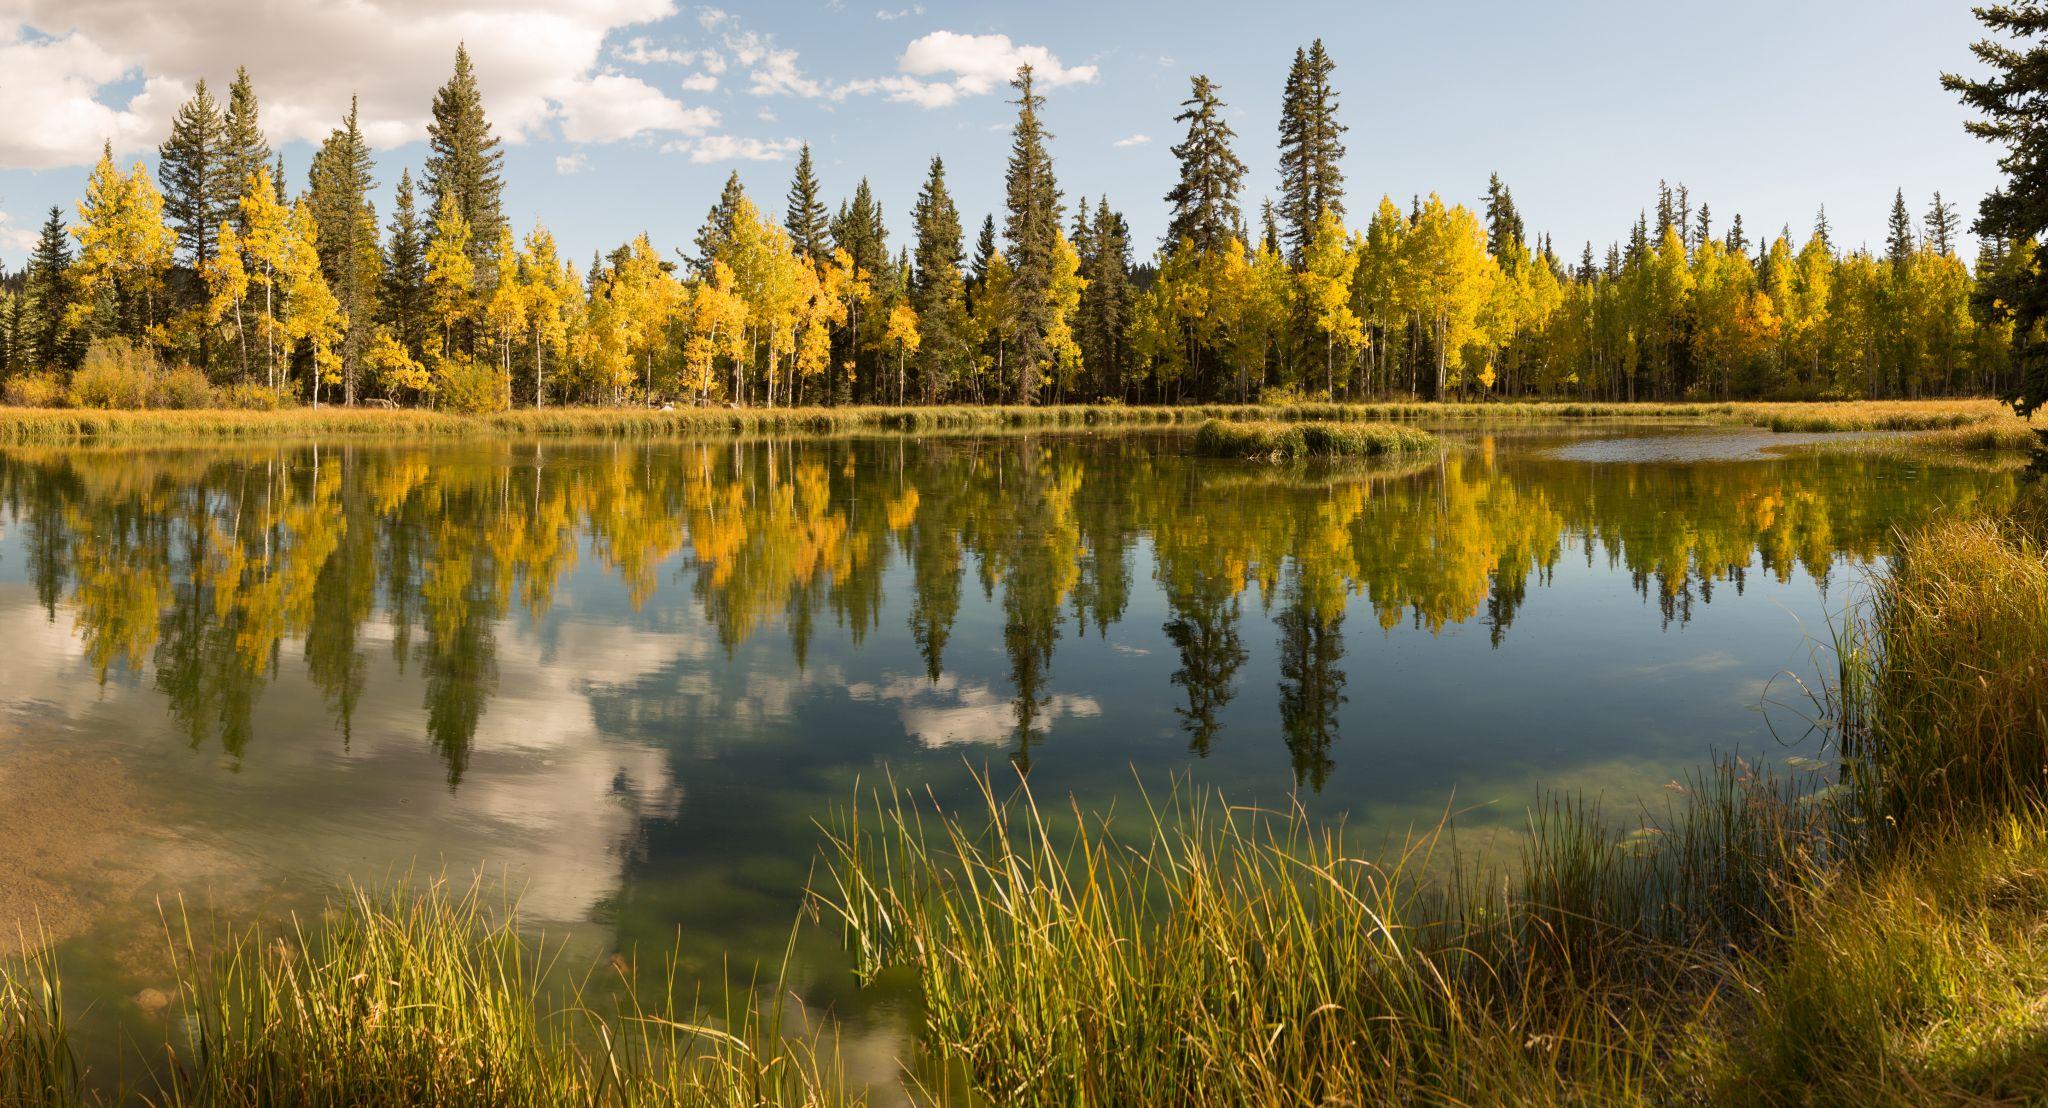 Aspen Mirror Lake, USA